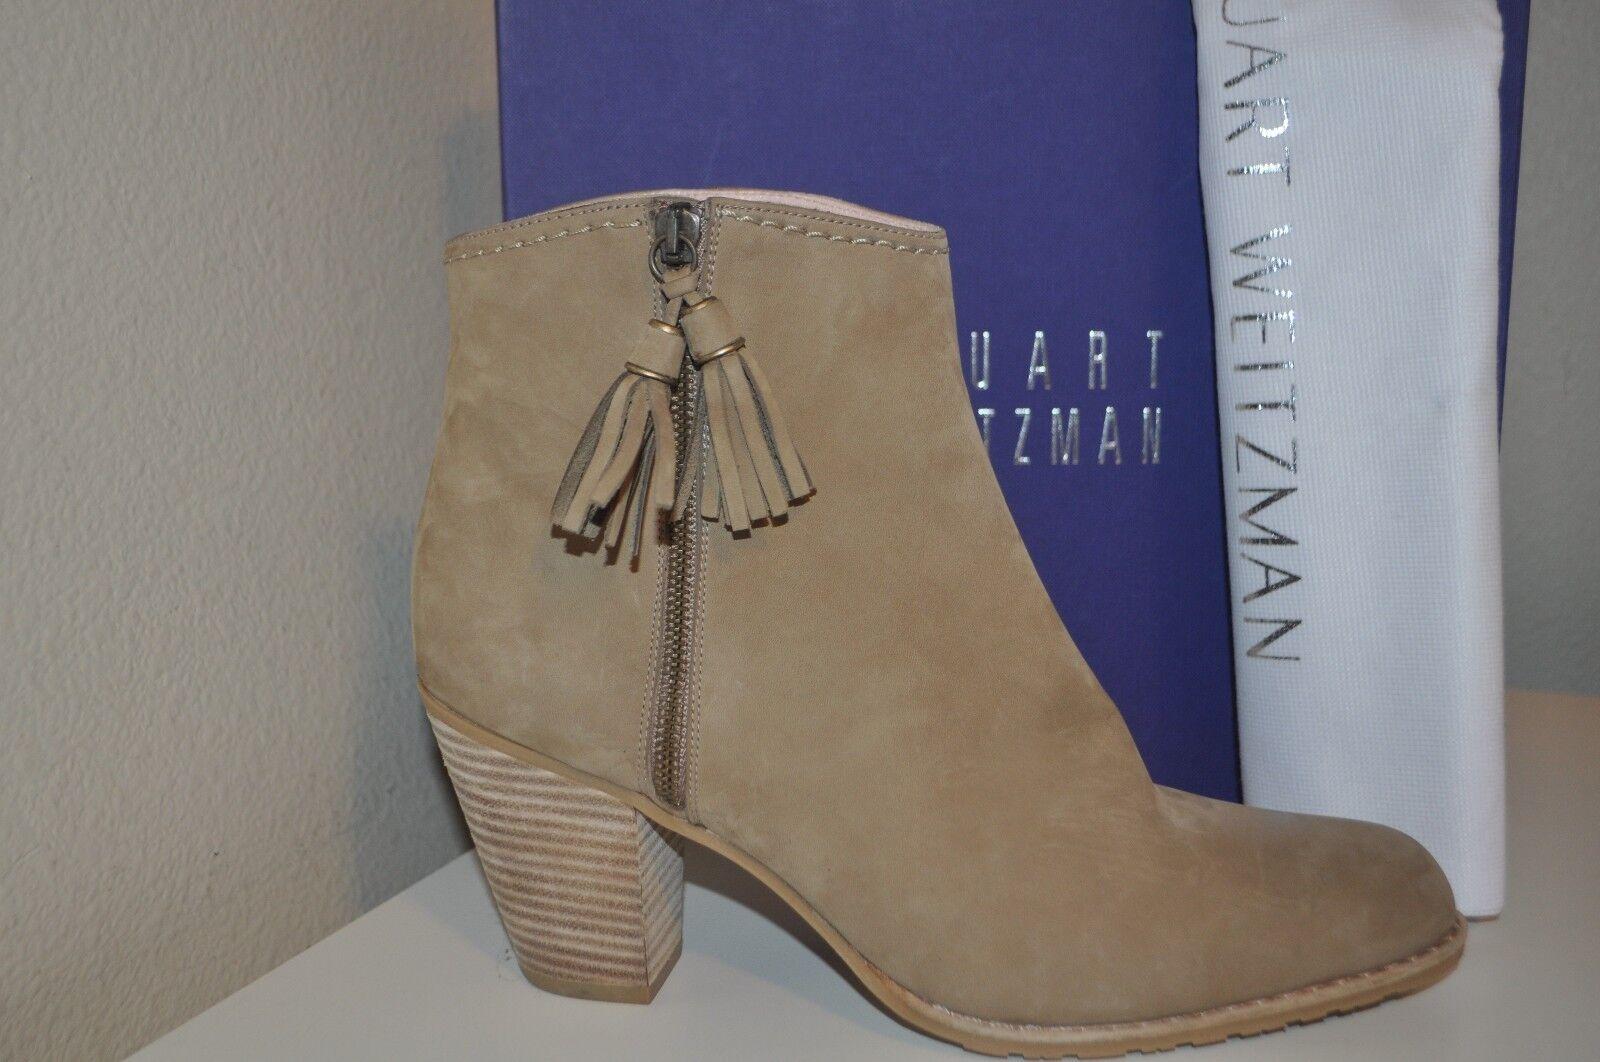 NIB Stuart Weitzman PRANCING Tassel Ankle Block Heel Boot Booties TAN NUBUC 10.5